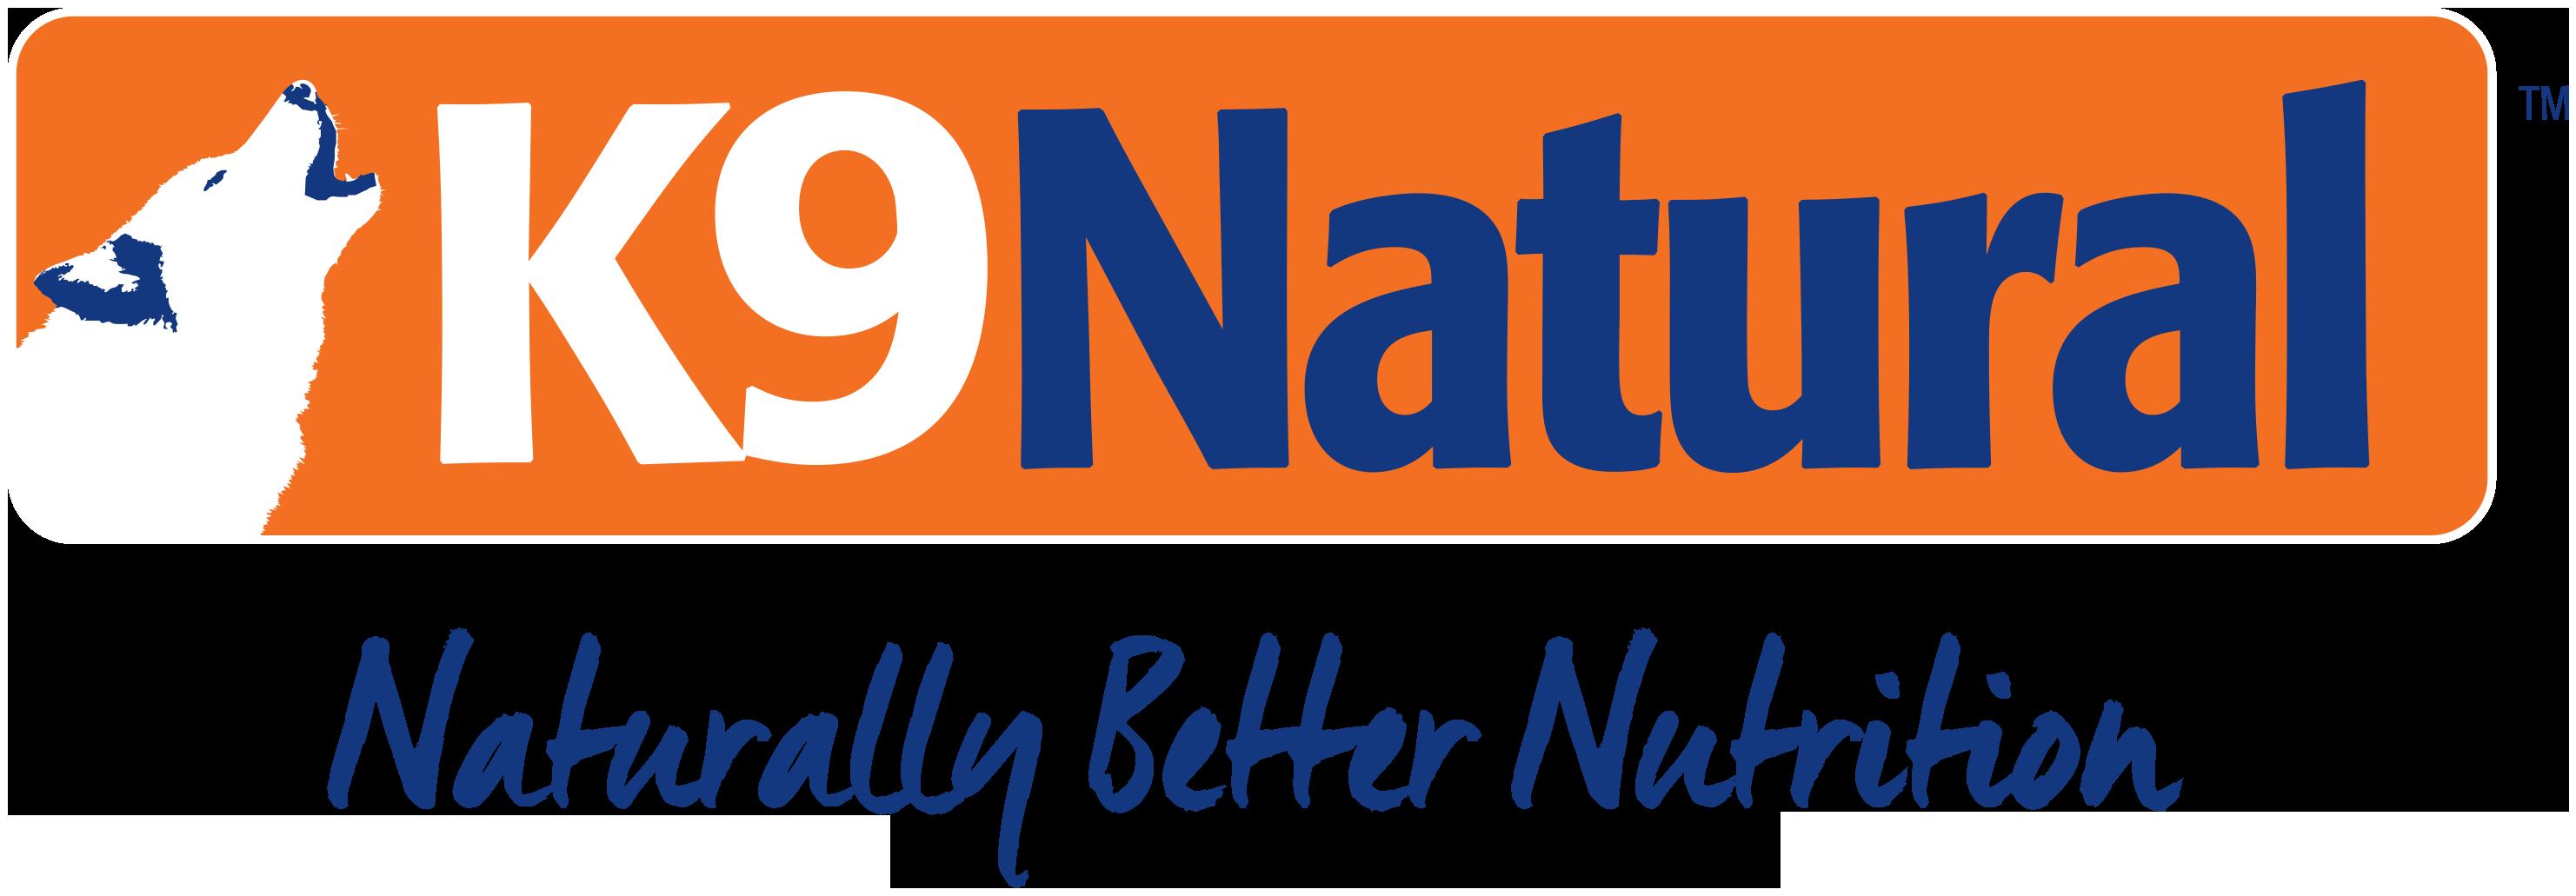 K9-Natural-logo-vector-w-blue-NBN-300dpi